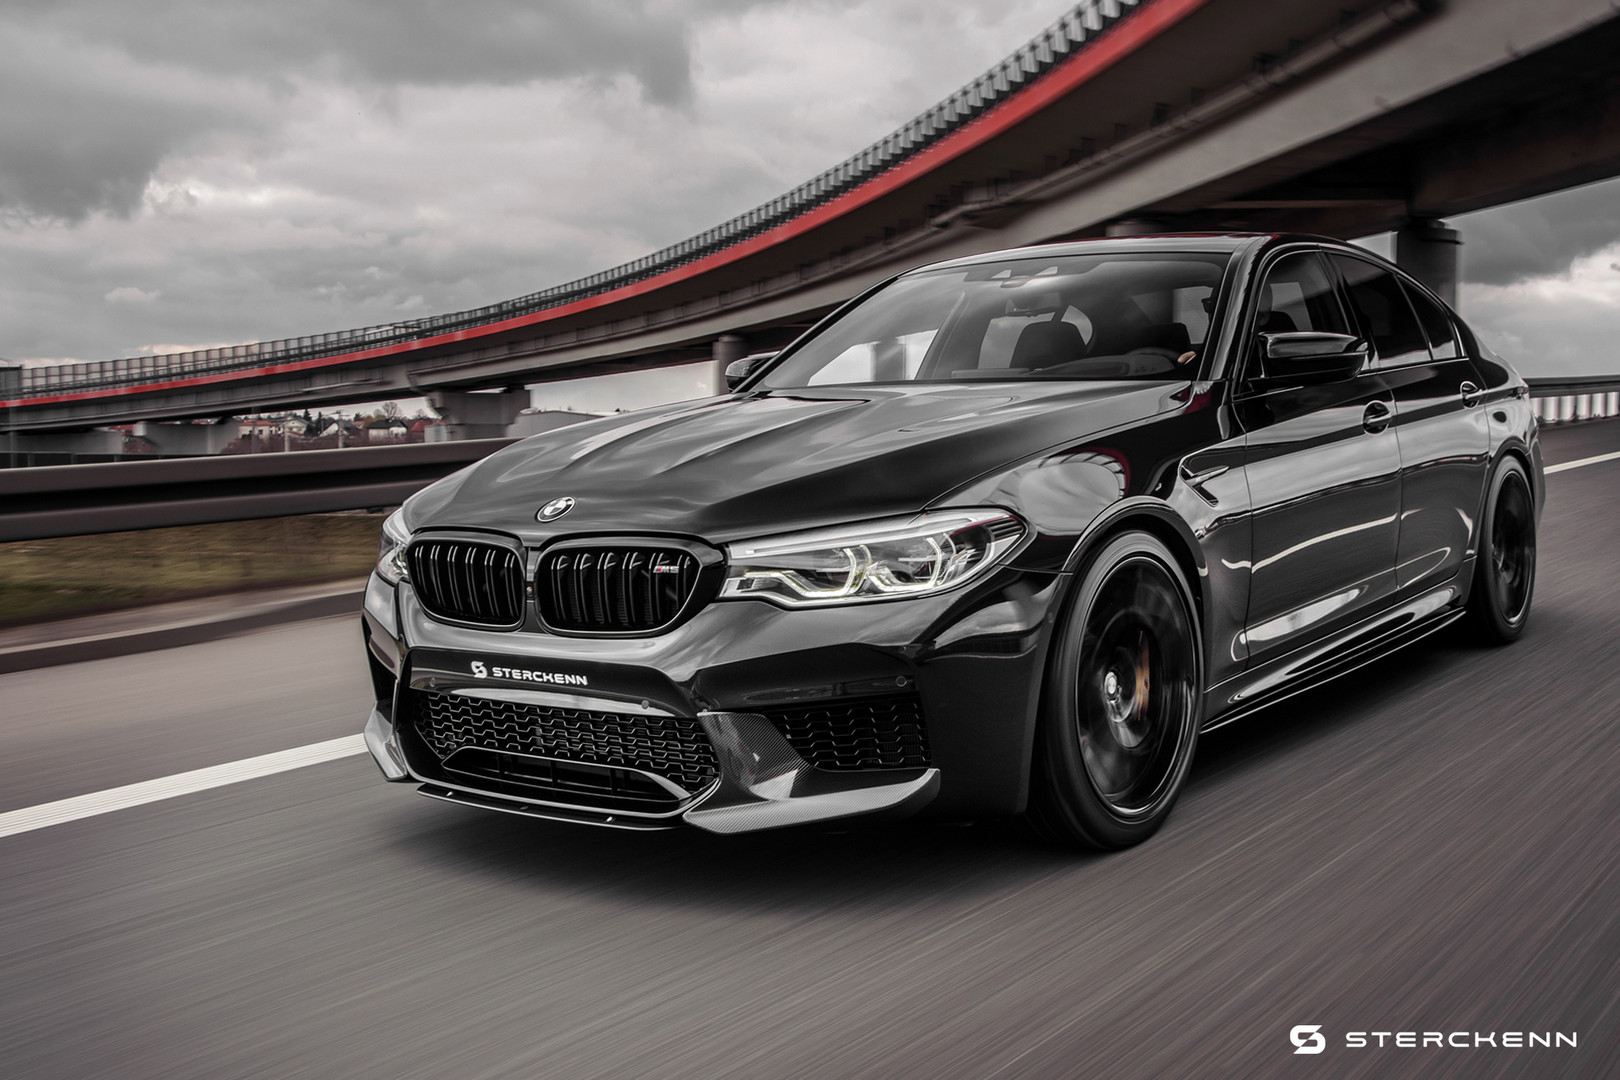 Tuned-BMW-M5-F90